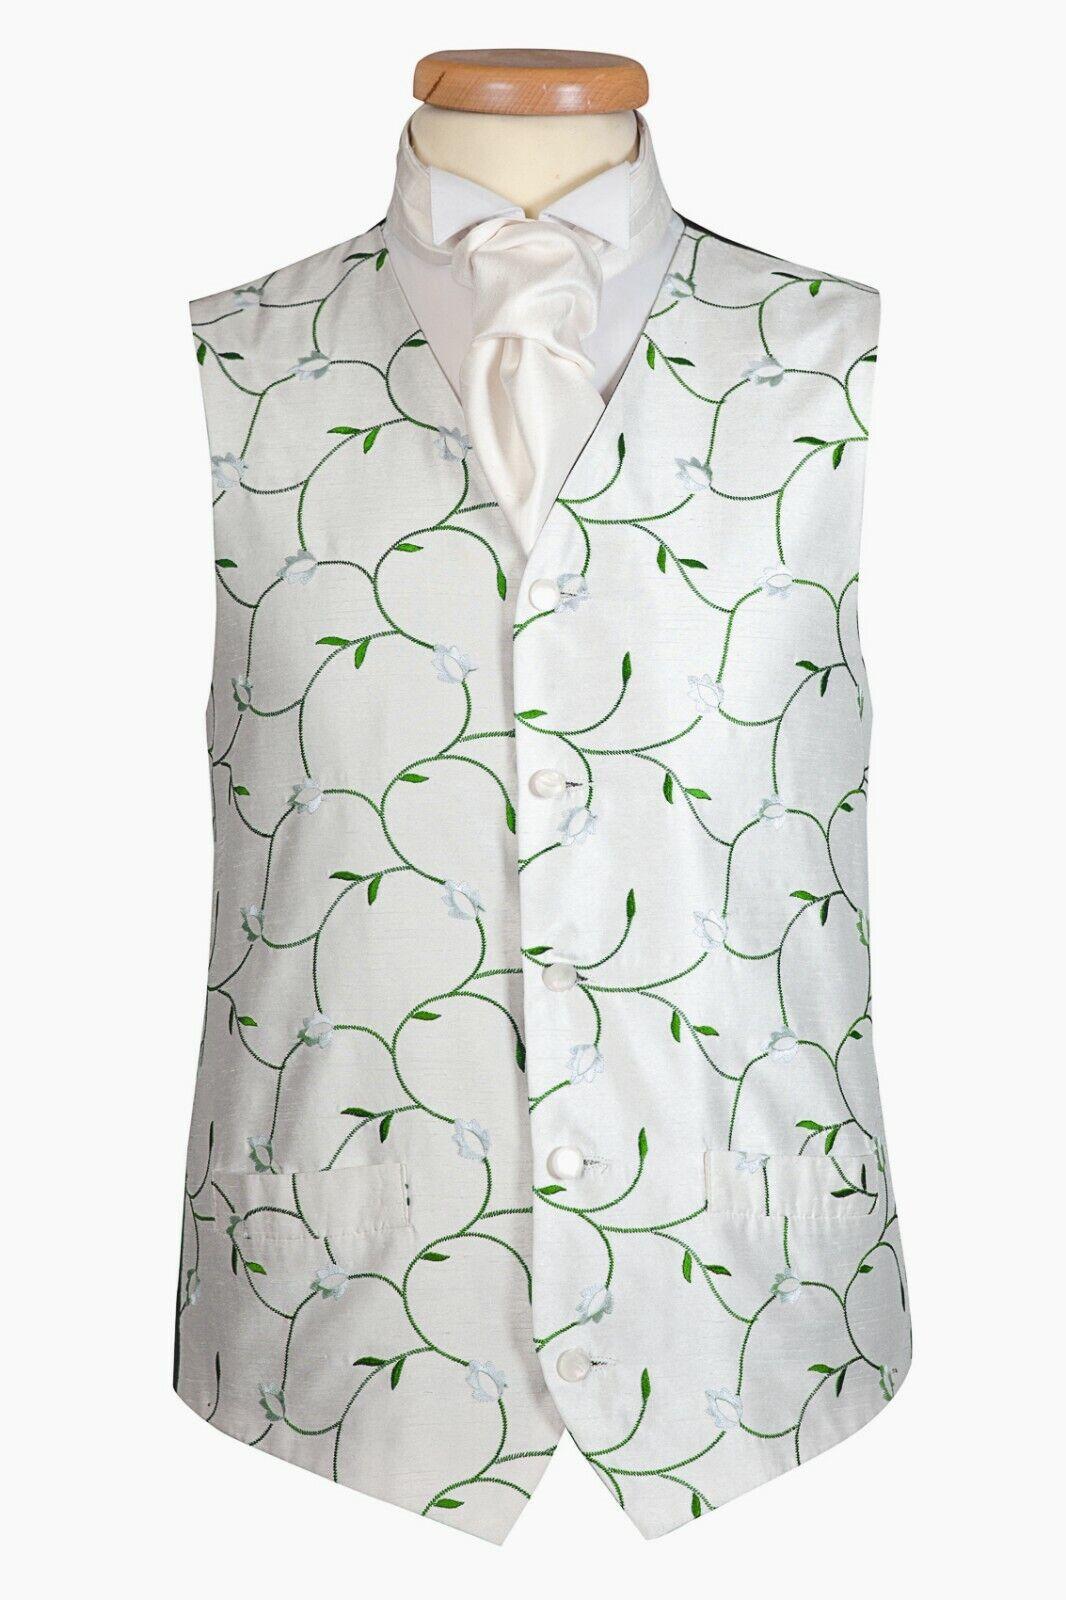 Green Leaf Debonair Waistcoat UK (A16)